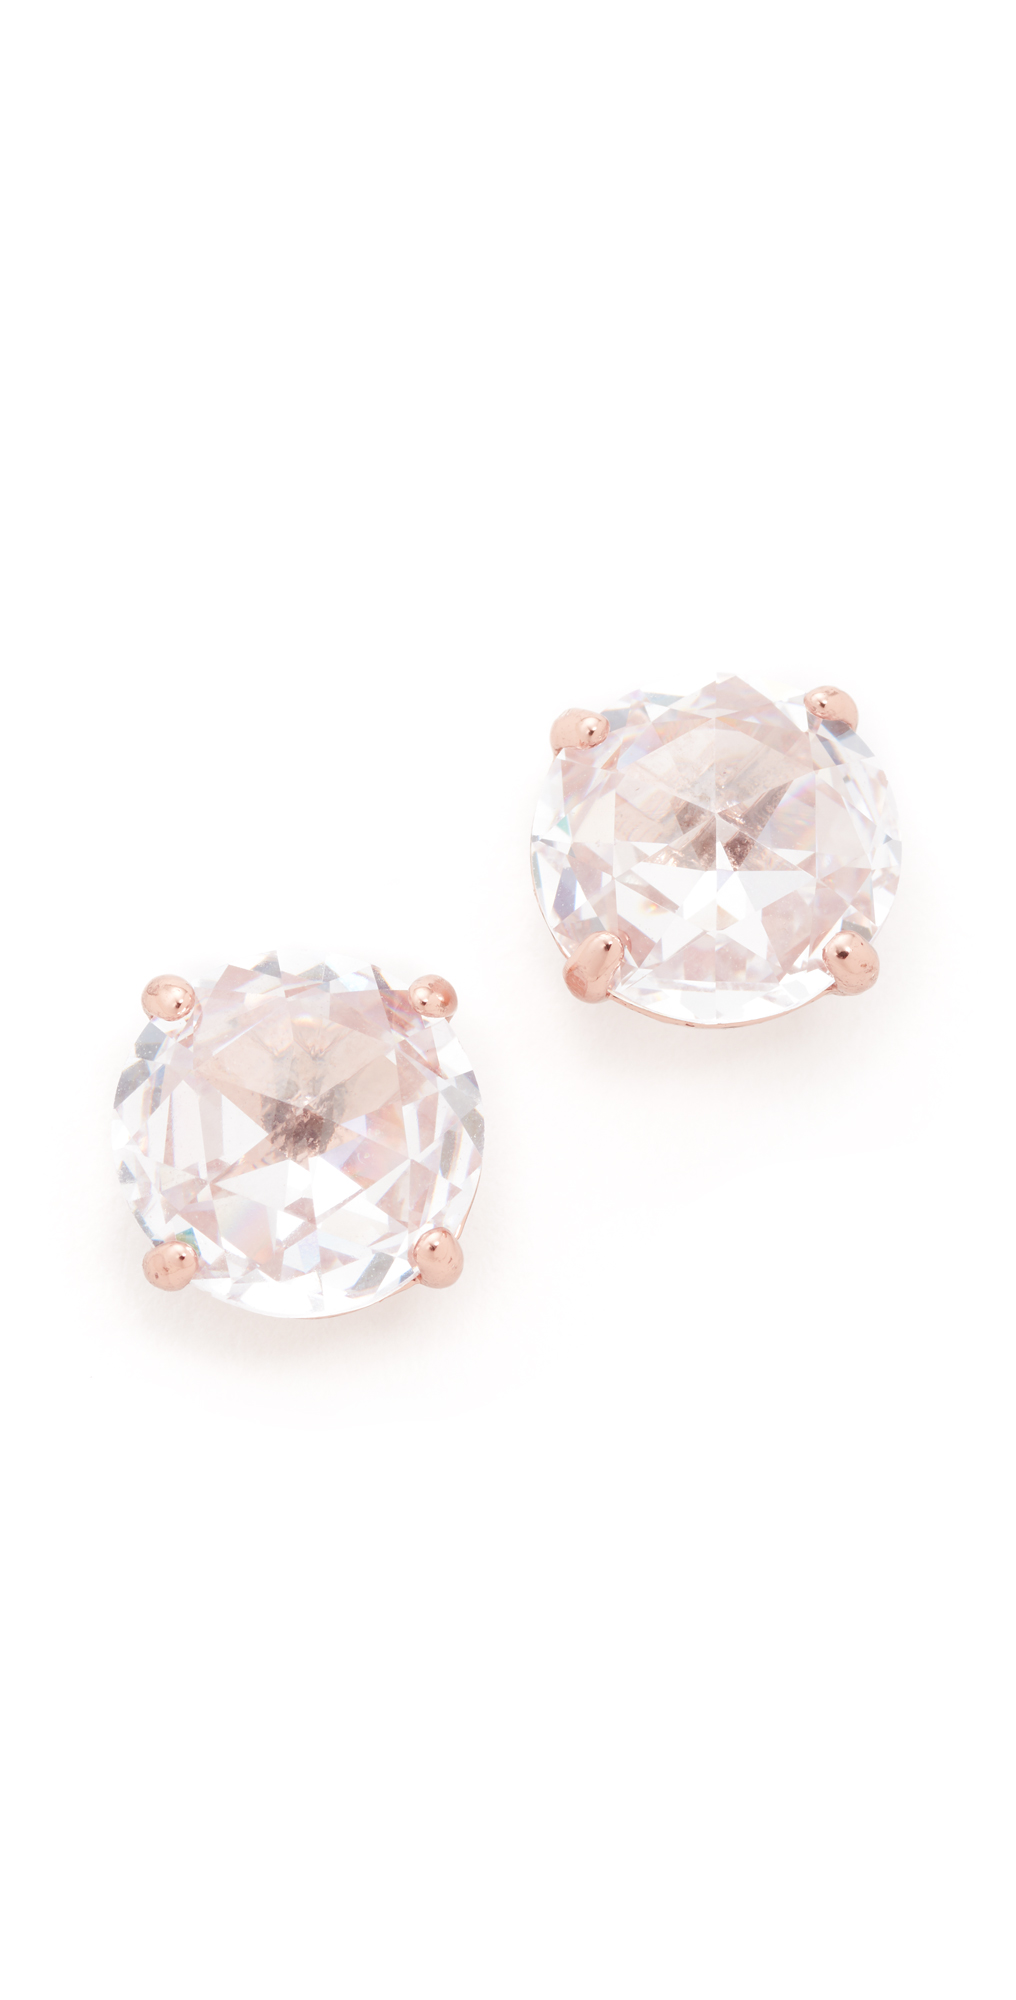 Bright Ideas Stud Earrings Kate Spade New York